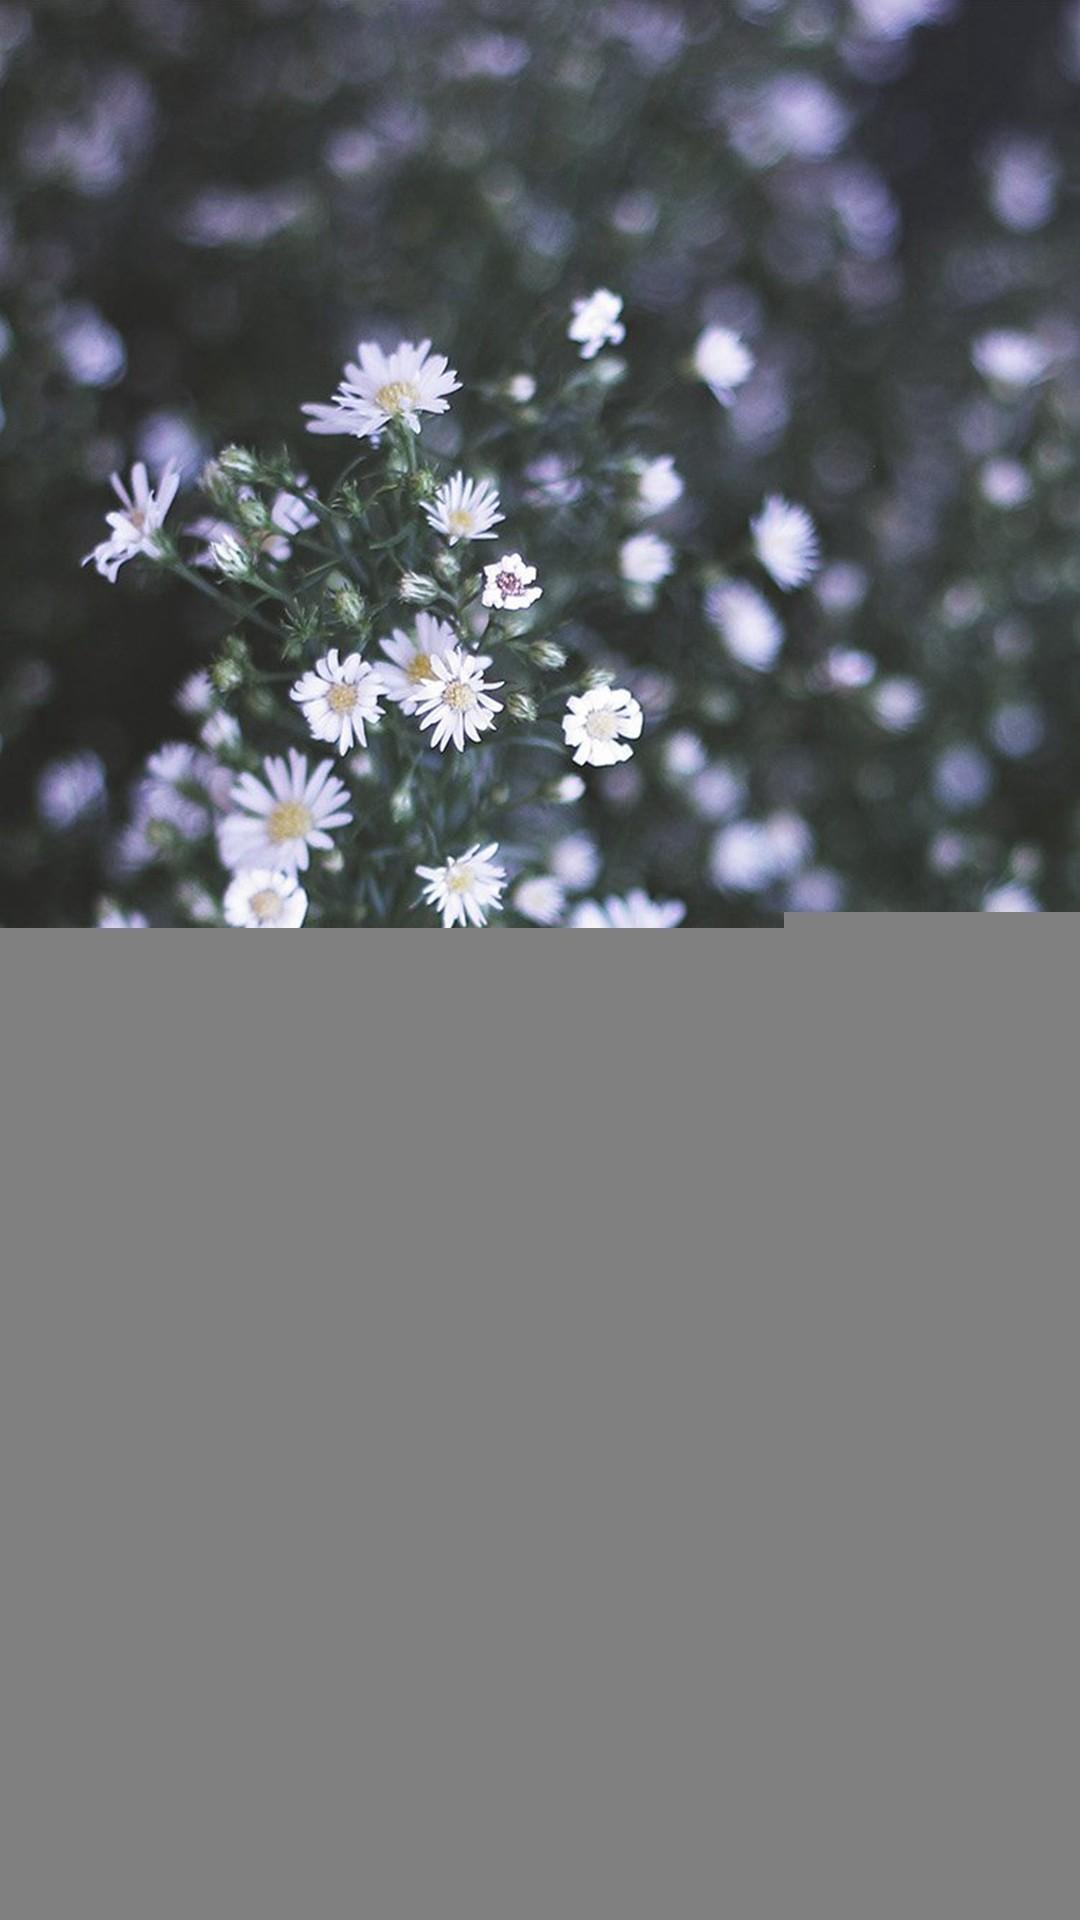 Flower White Spring Nature iPhone 8 wallpaper